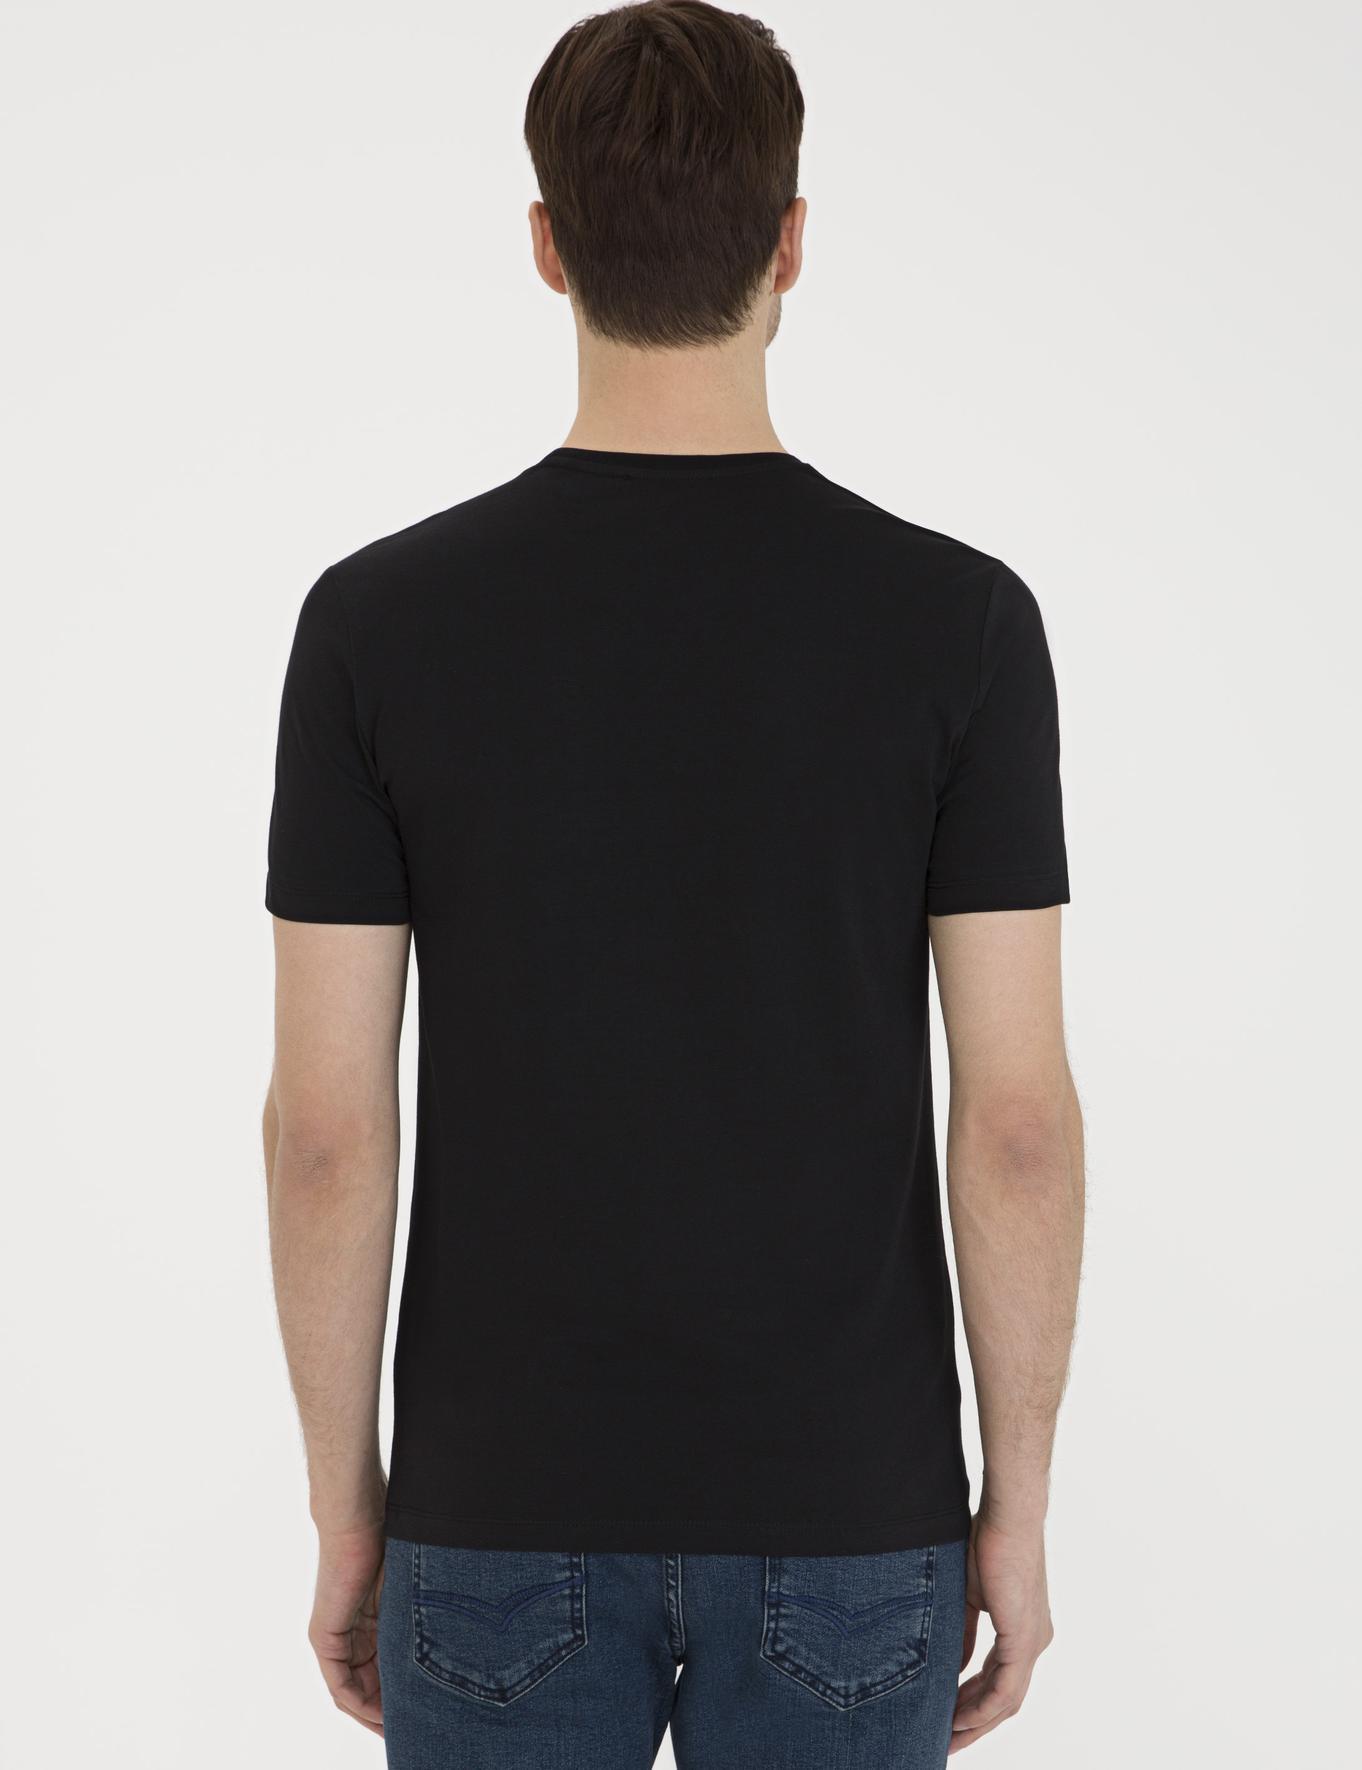 Bisiklet Yaka Basic T-Shirt - 50239168001